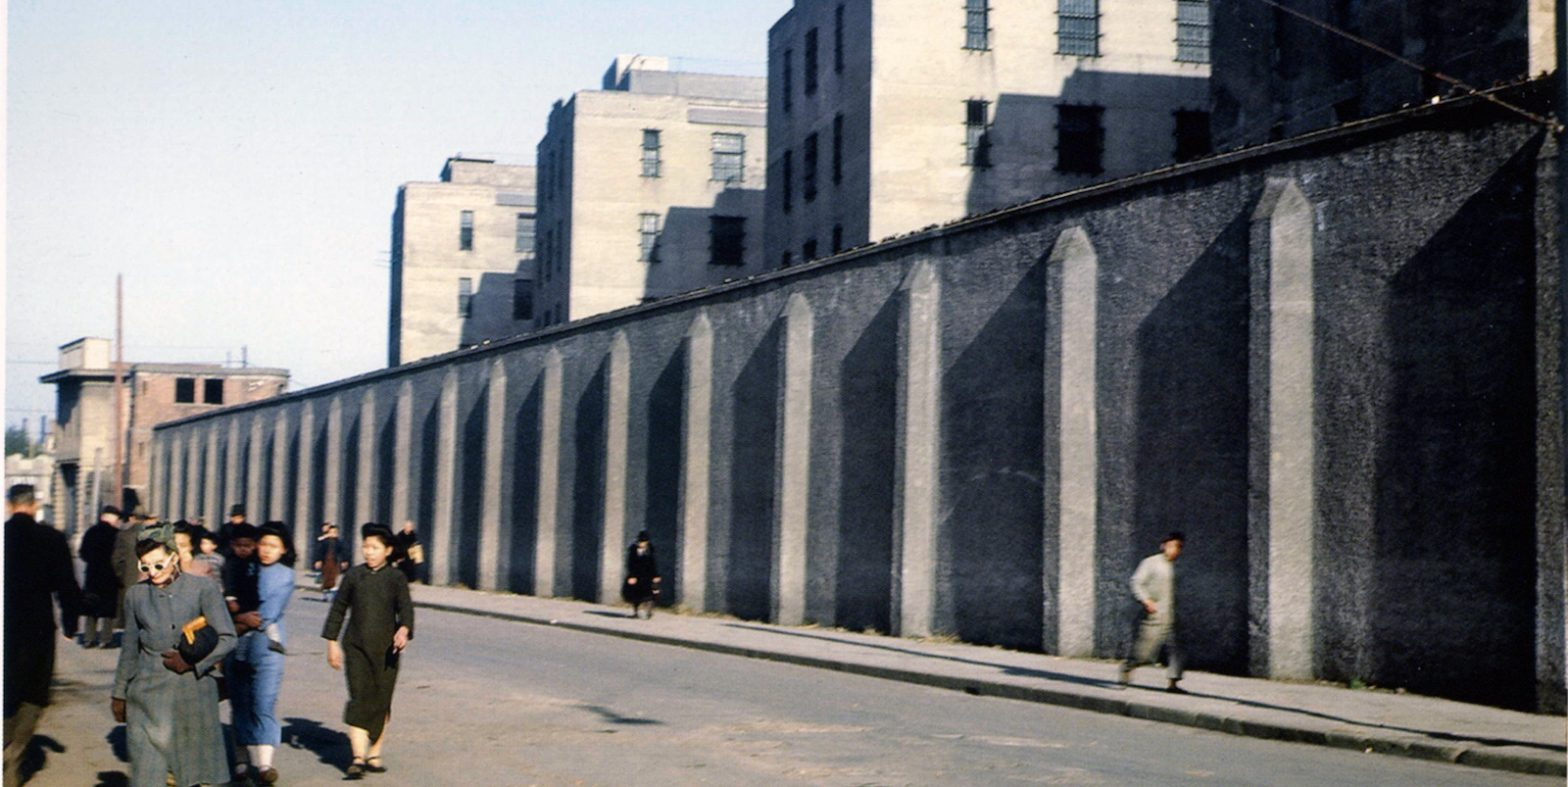 Улица за тюрьмой (Kunming Road) в 1945 году (c) книга China from the Eyes of the Flying Tigers 1944-1945